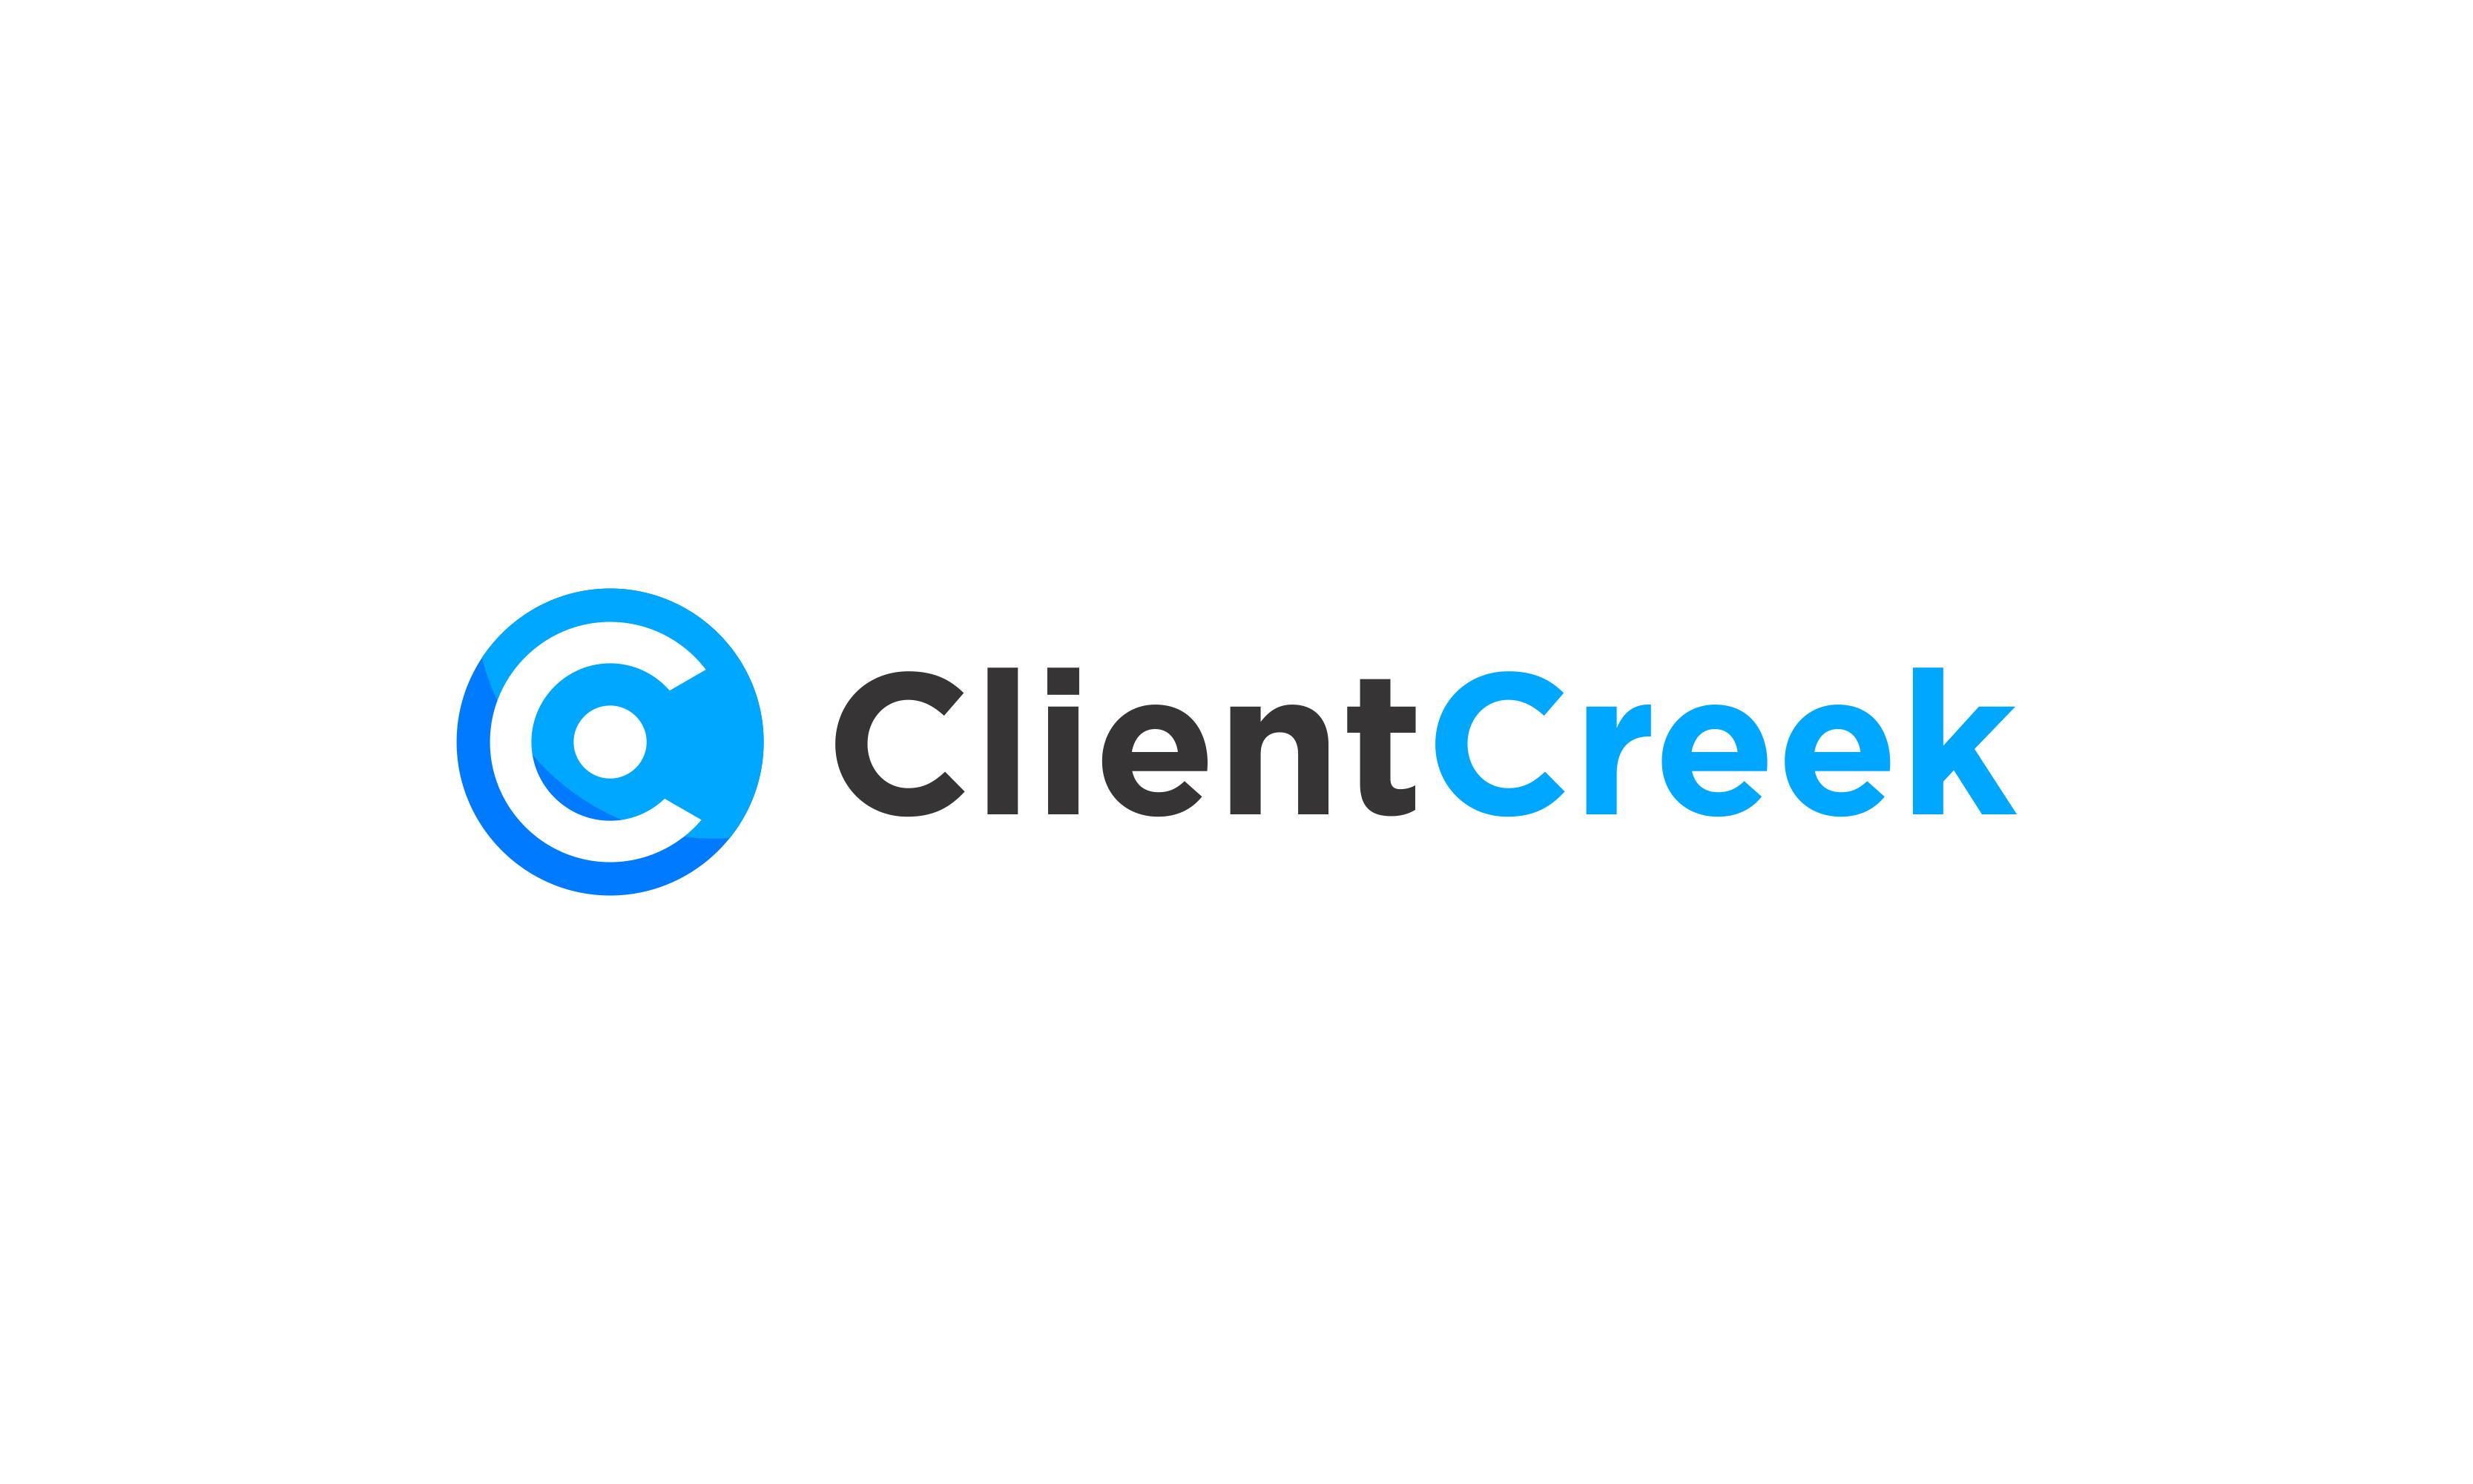 Clientcreek